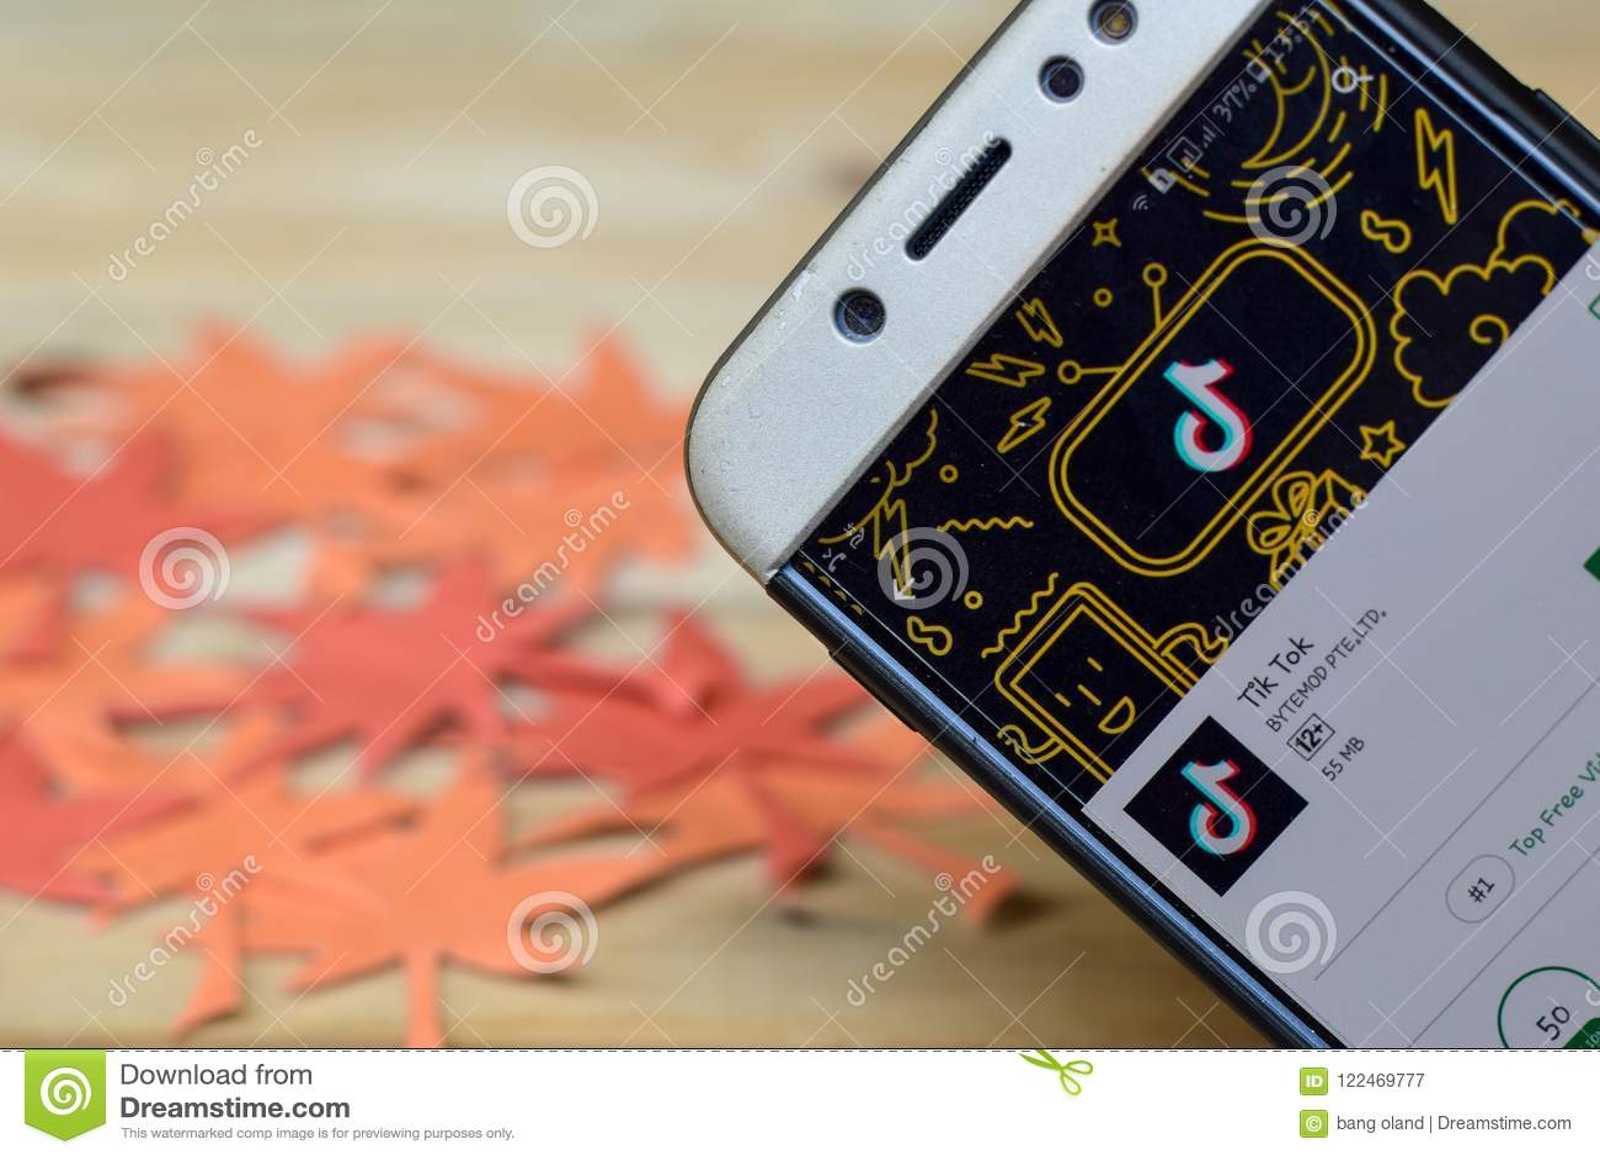 Tik Tok App On Smartphone Screen  Editorial Photography